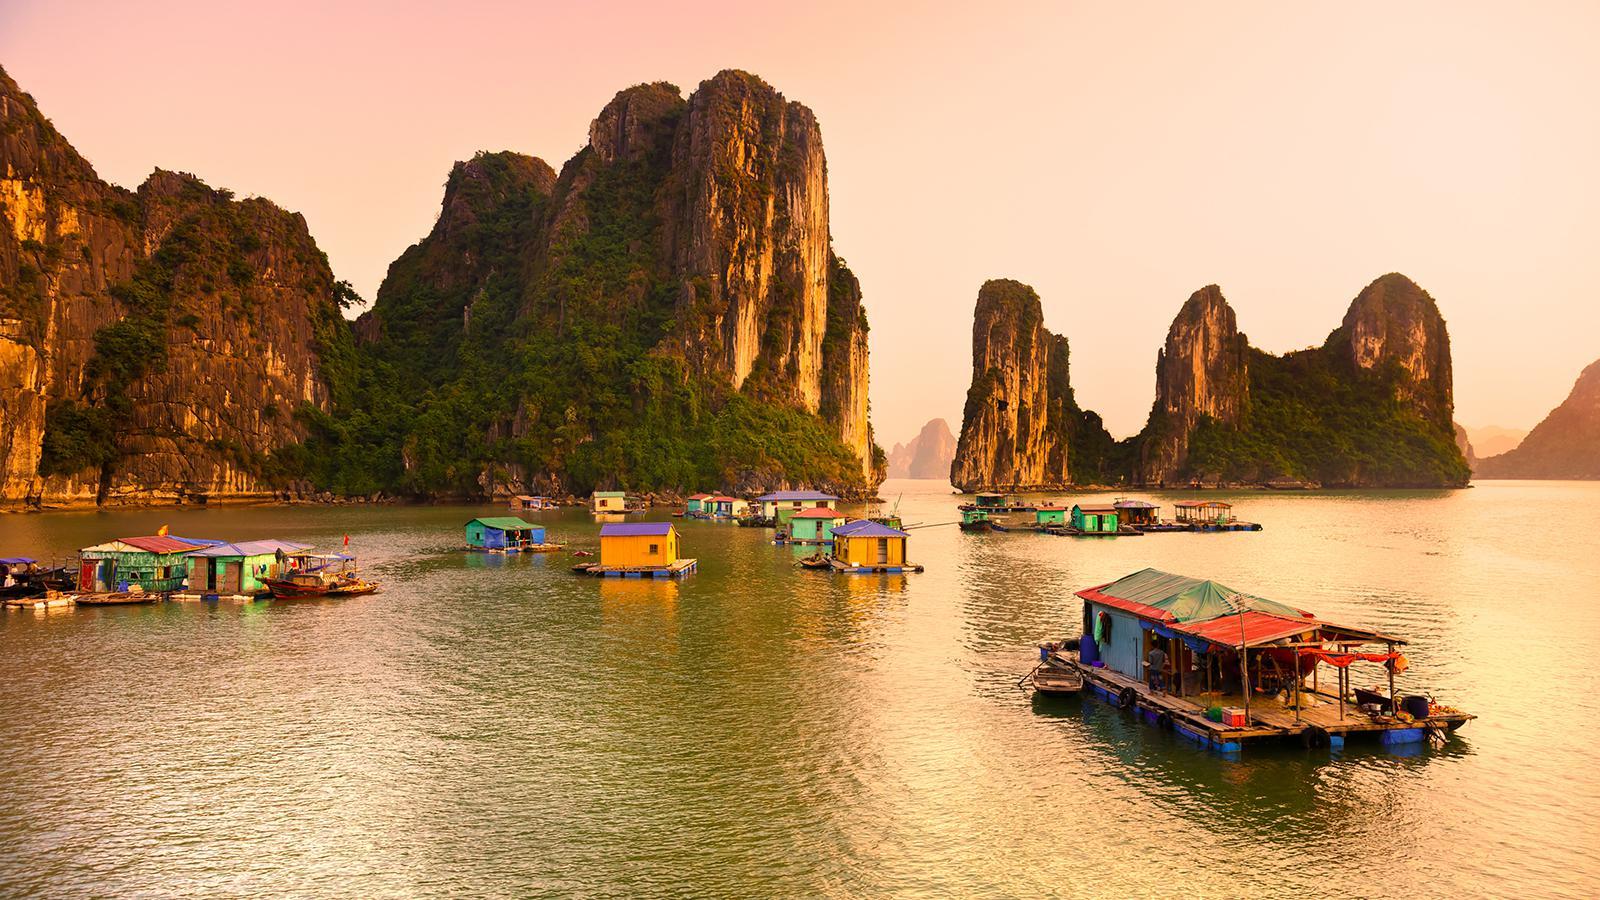 vietnam 15 μέρη που αξίζει να επισκεφτείς μέσα στο 2017